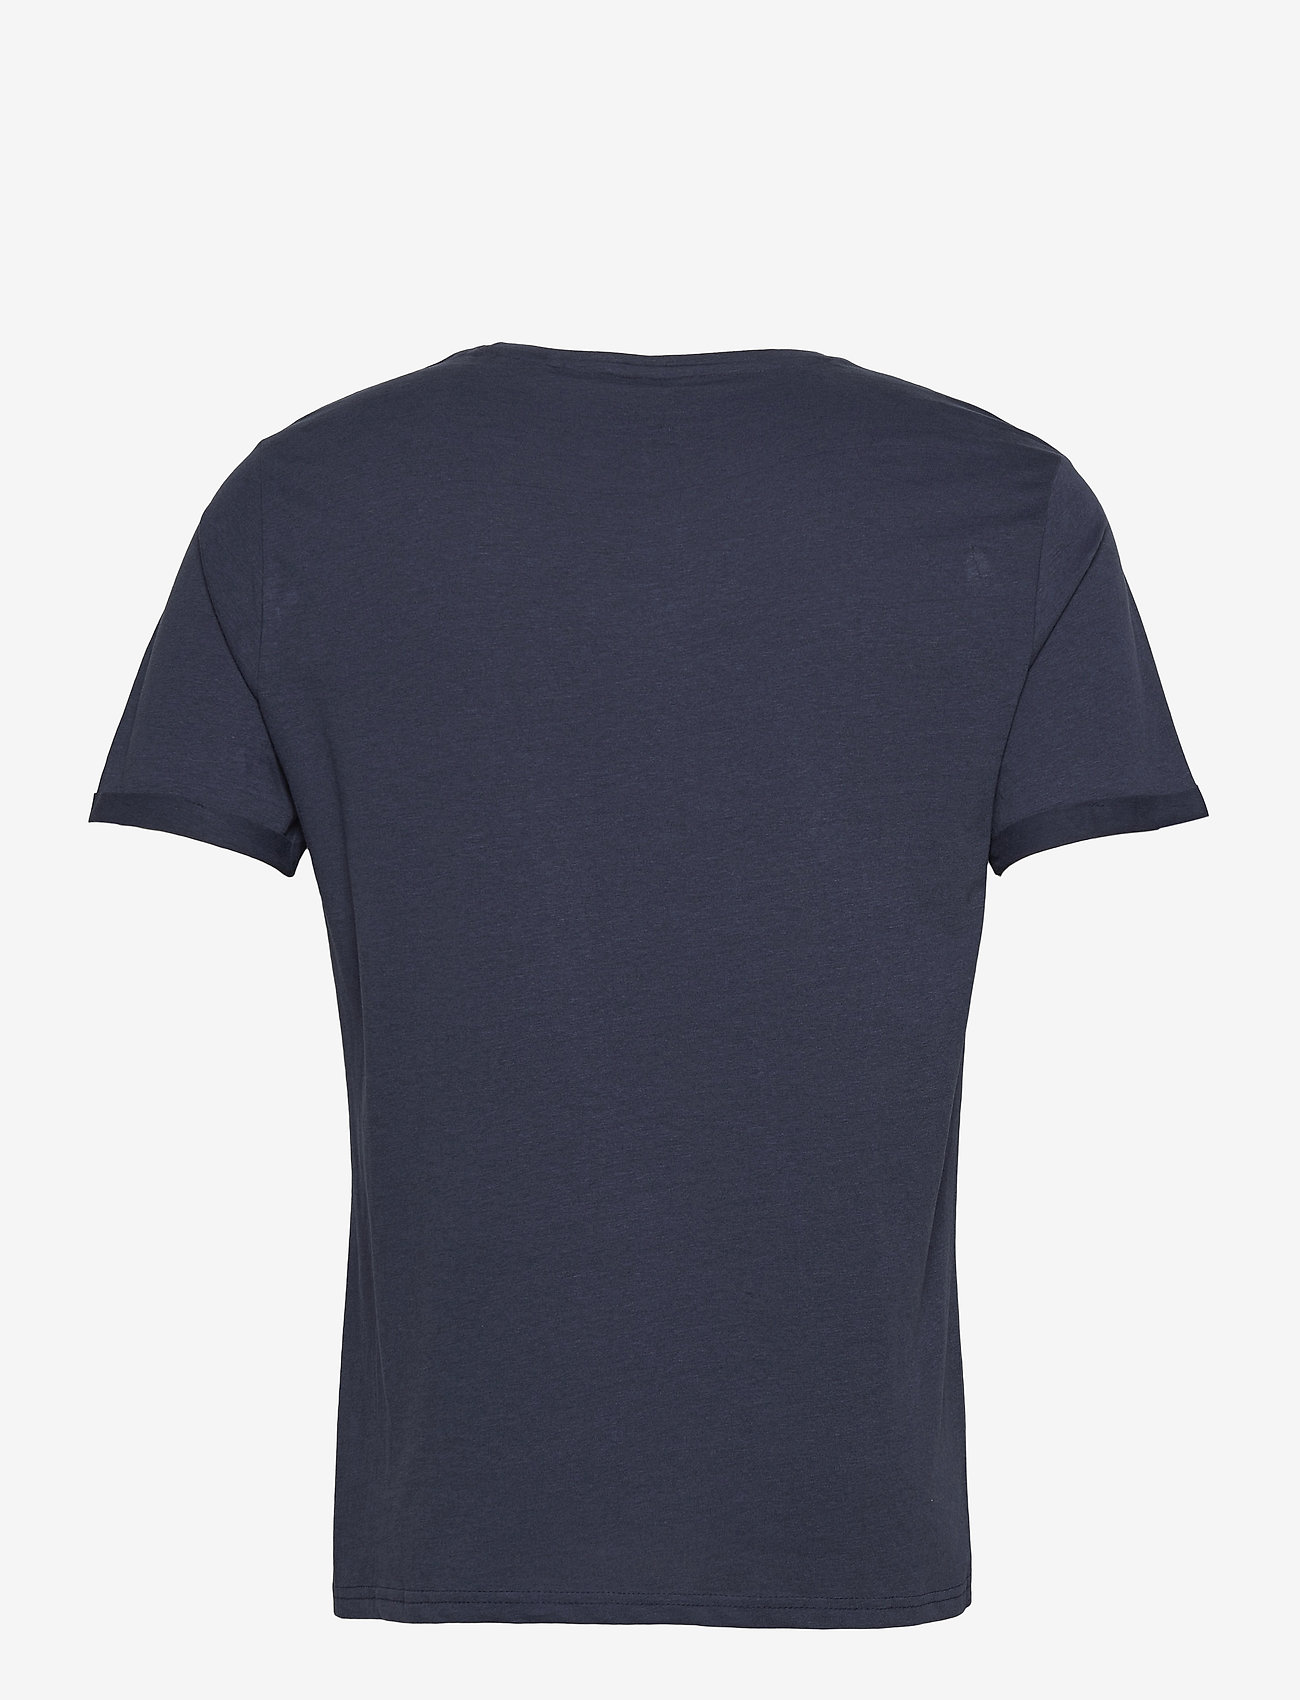 Blend - Tee - basic t-shirts - dress blues - 1